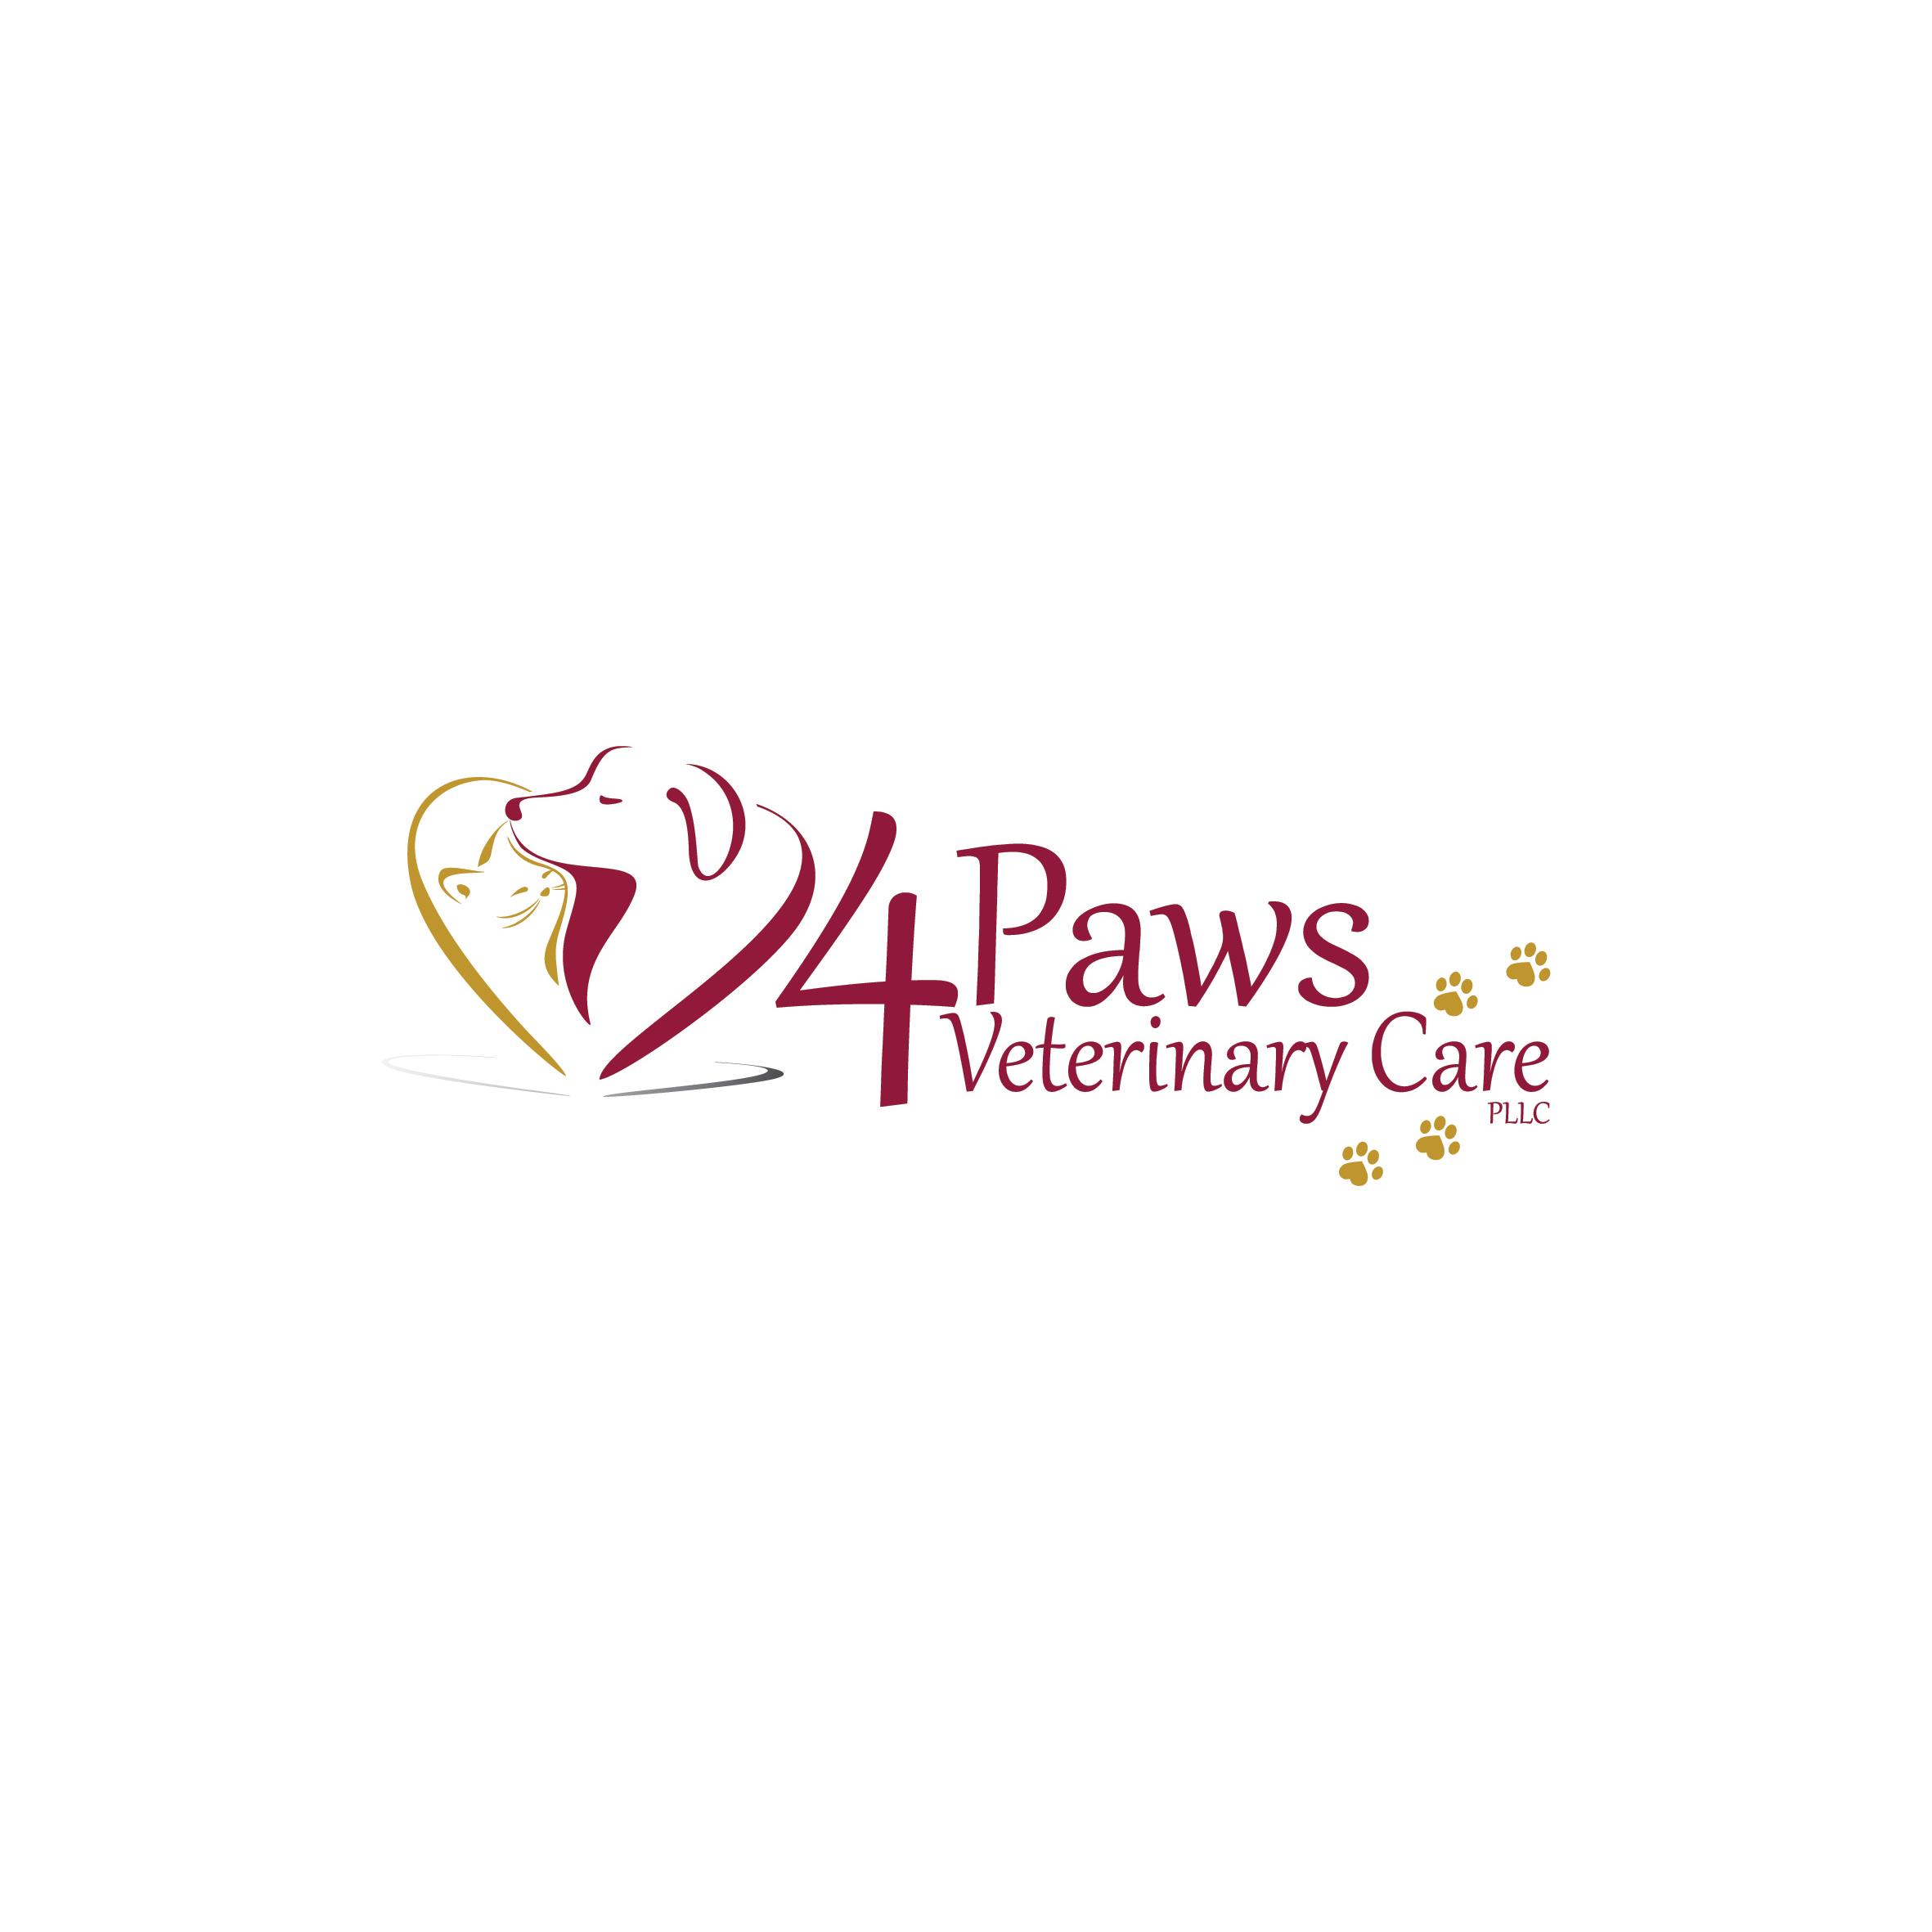 4 Paws Veterinary Care, PLLC